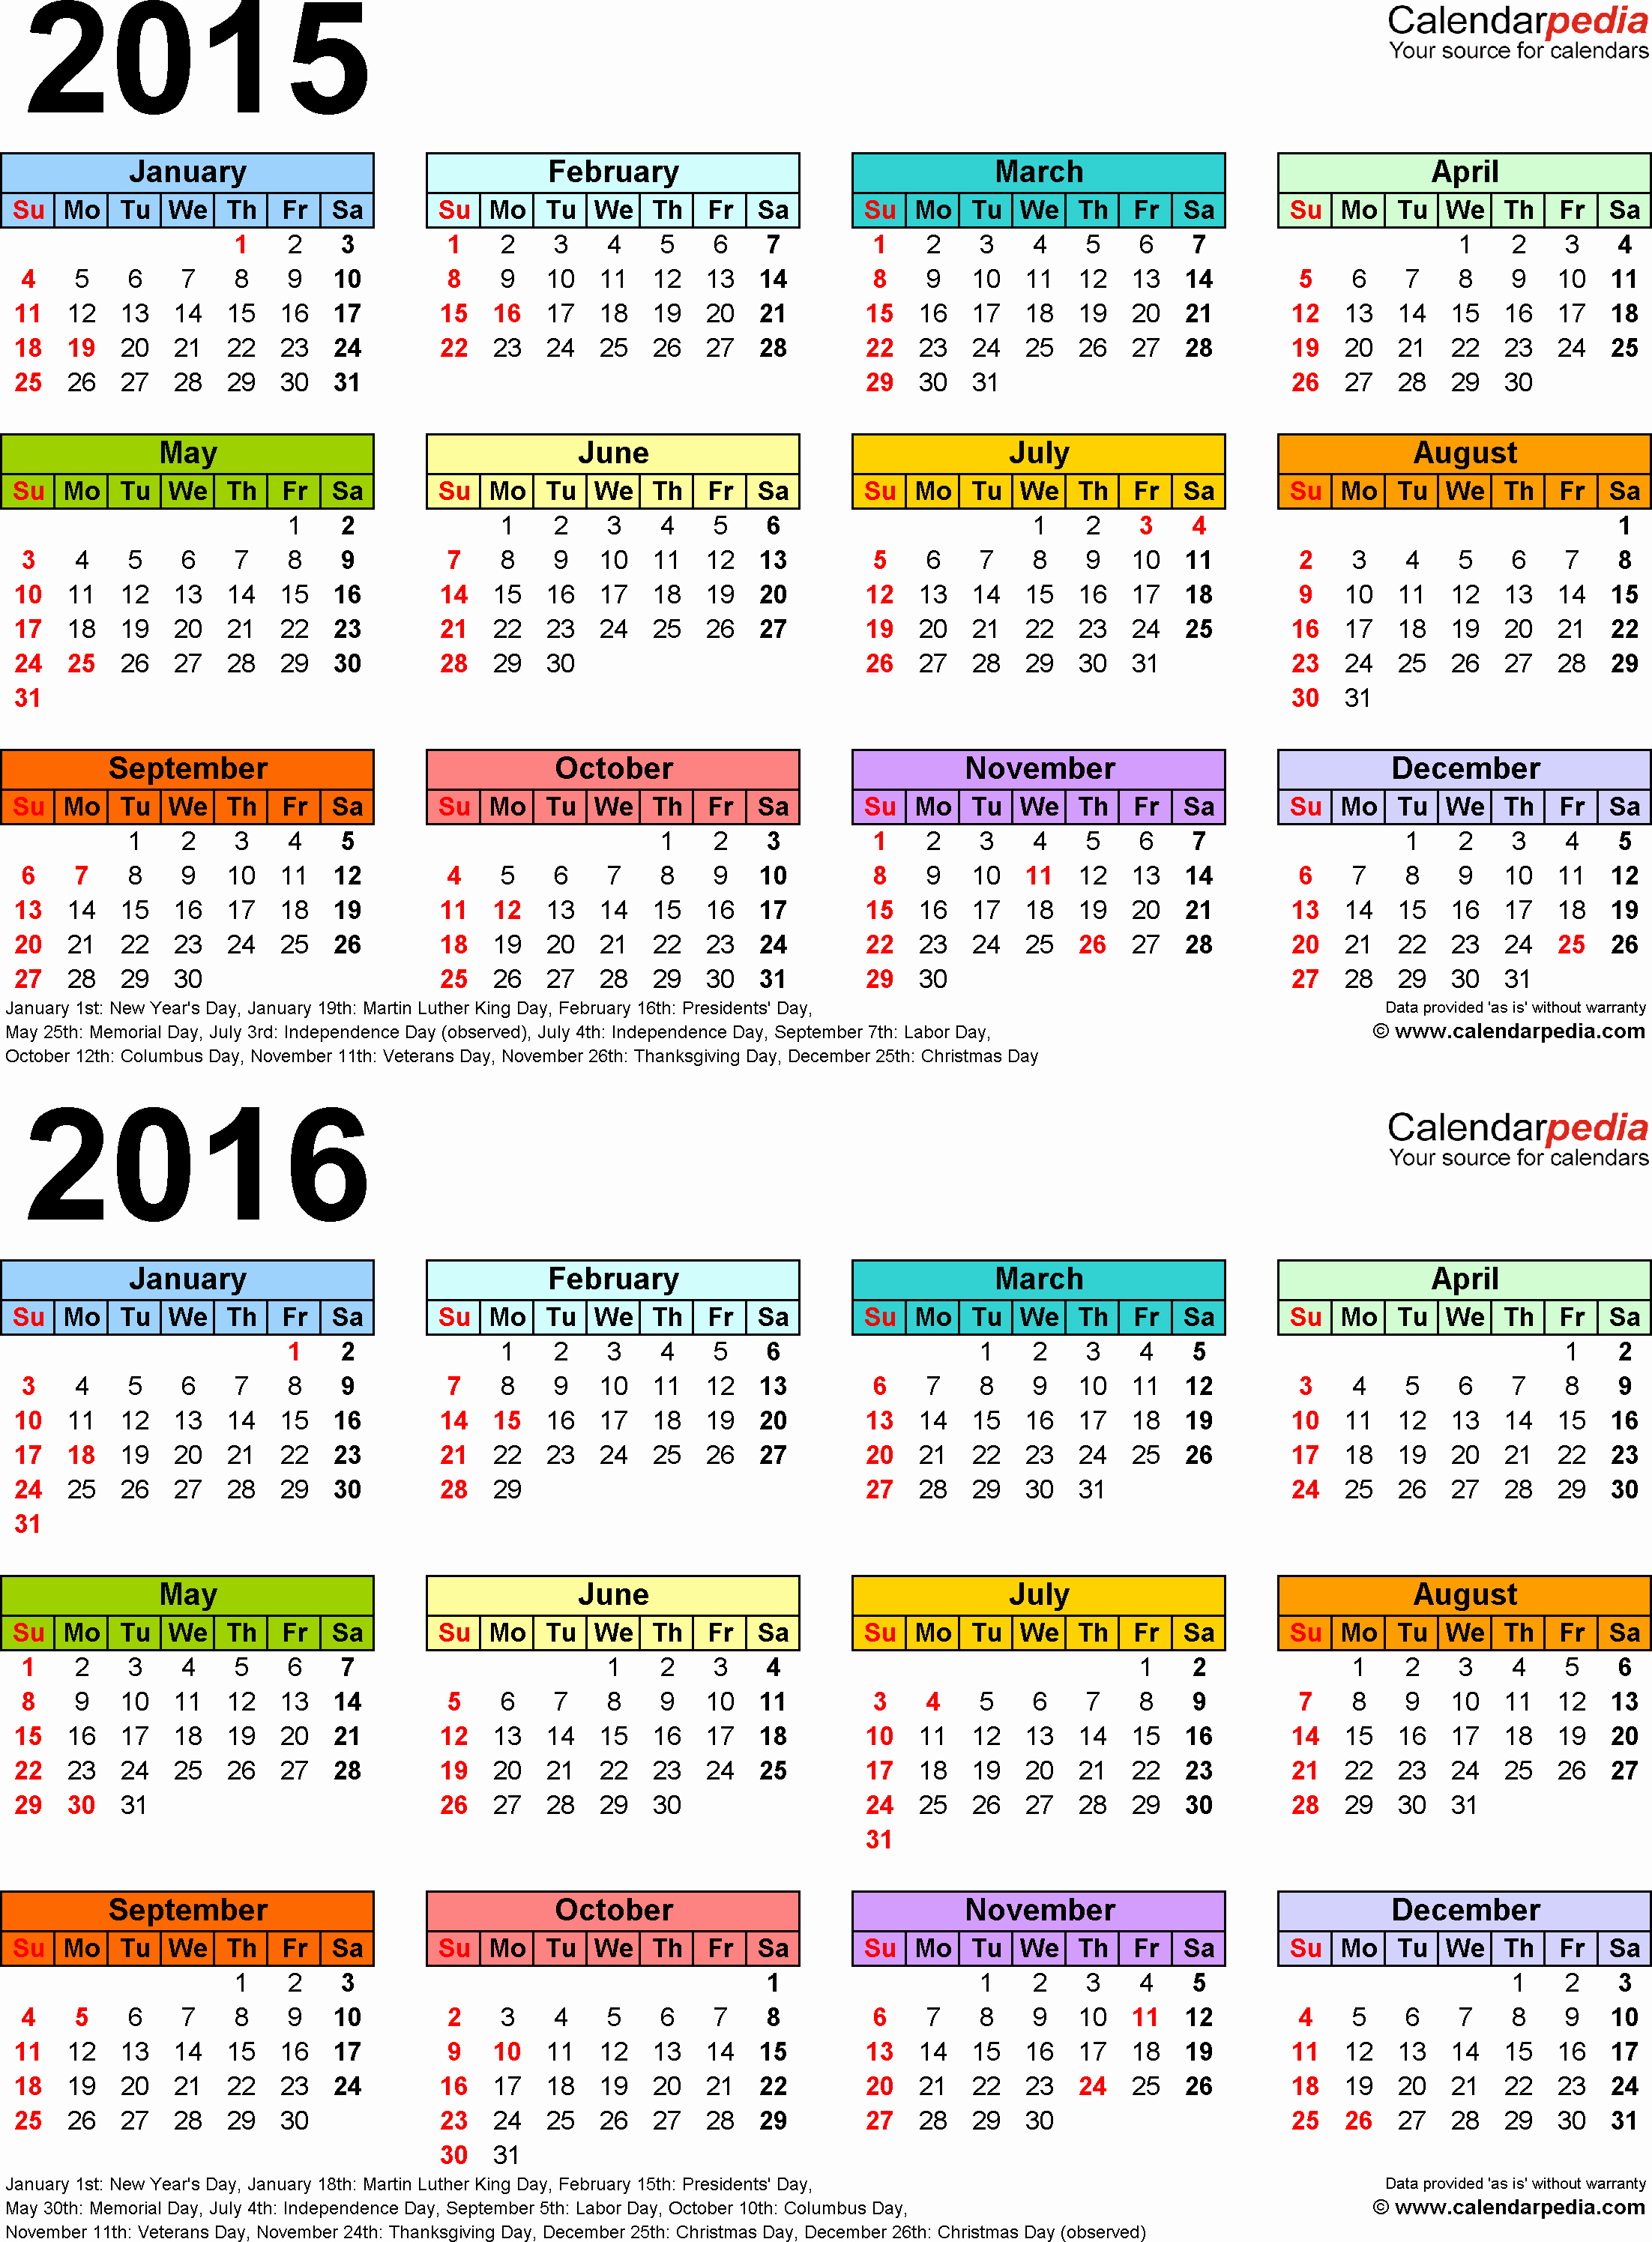 Calendar 2016-17 Template Awesome 2015 2016 Calendar Free Printable Two Year Pdf Calendars